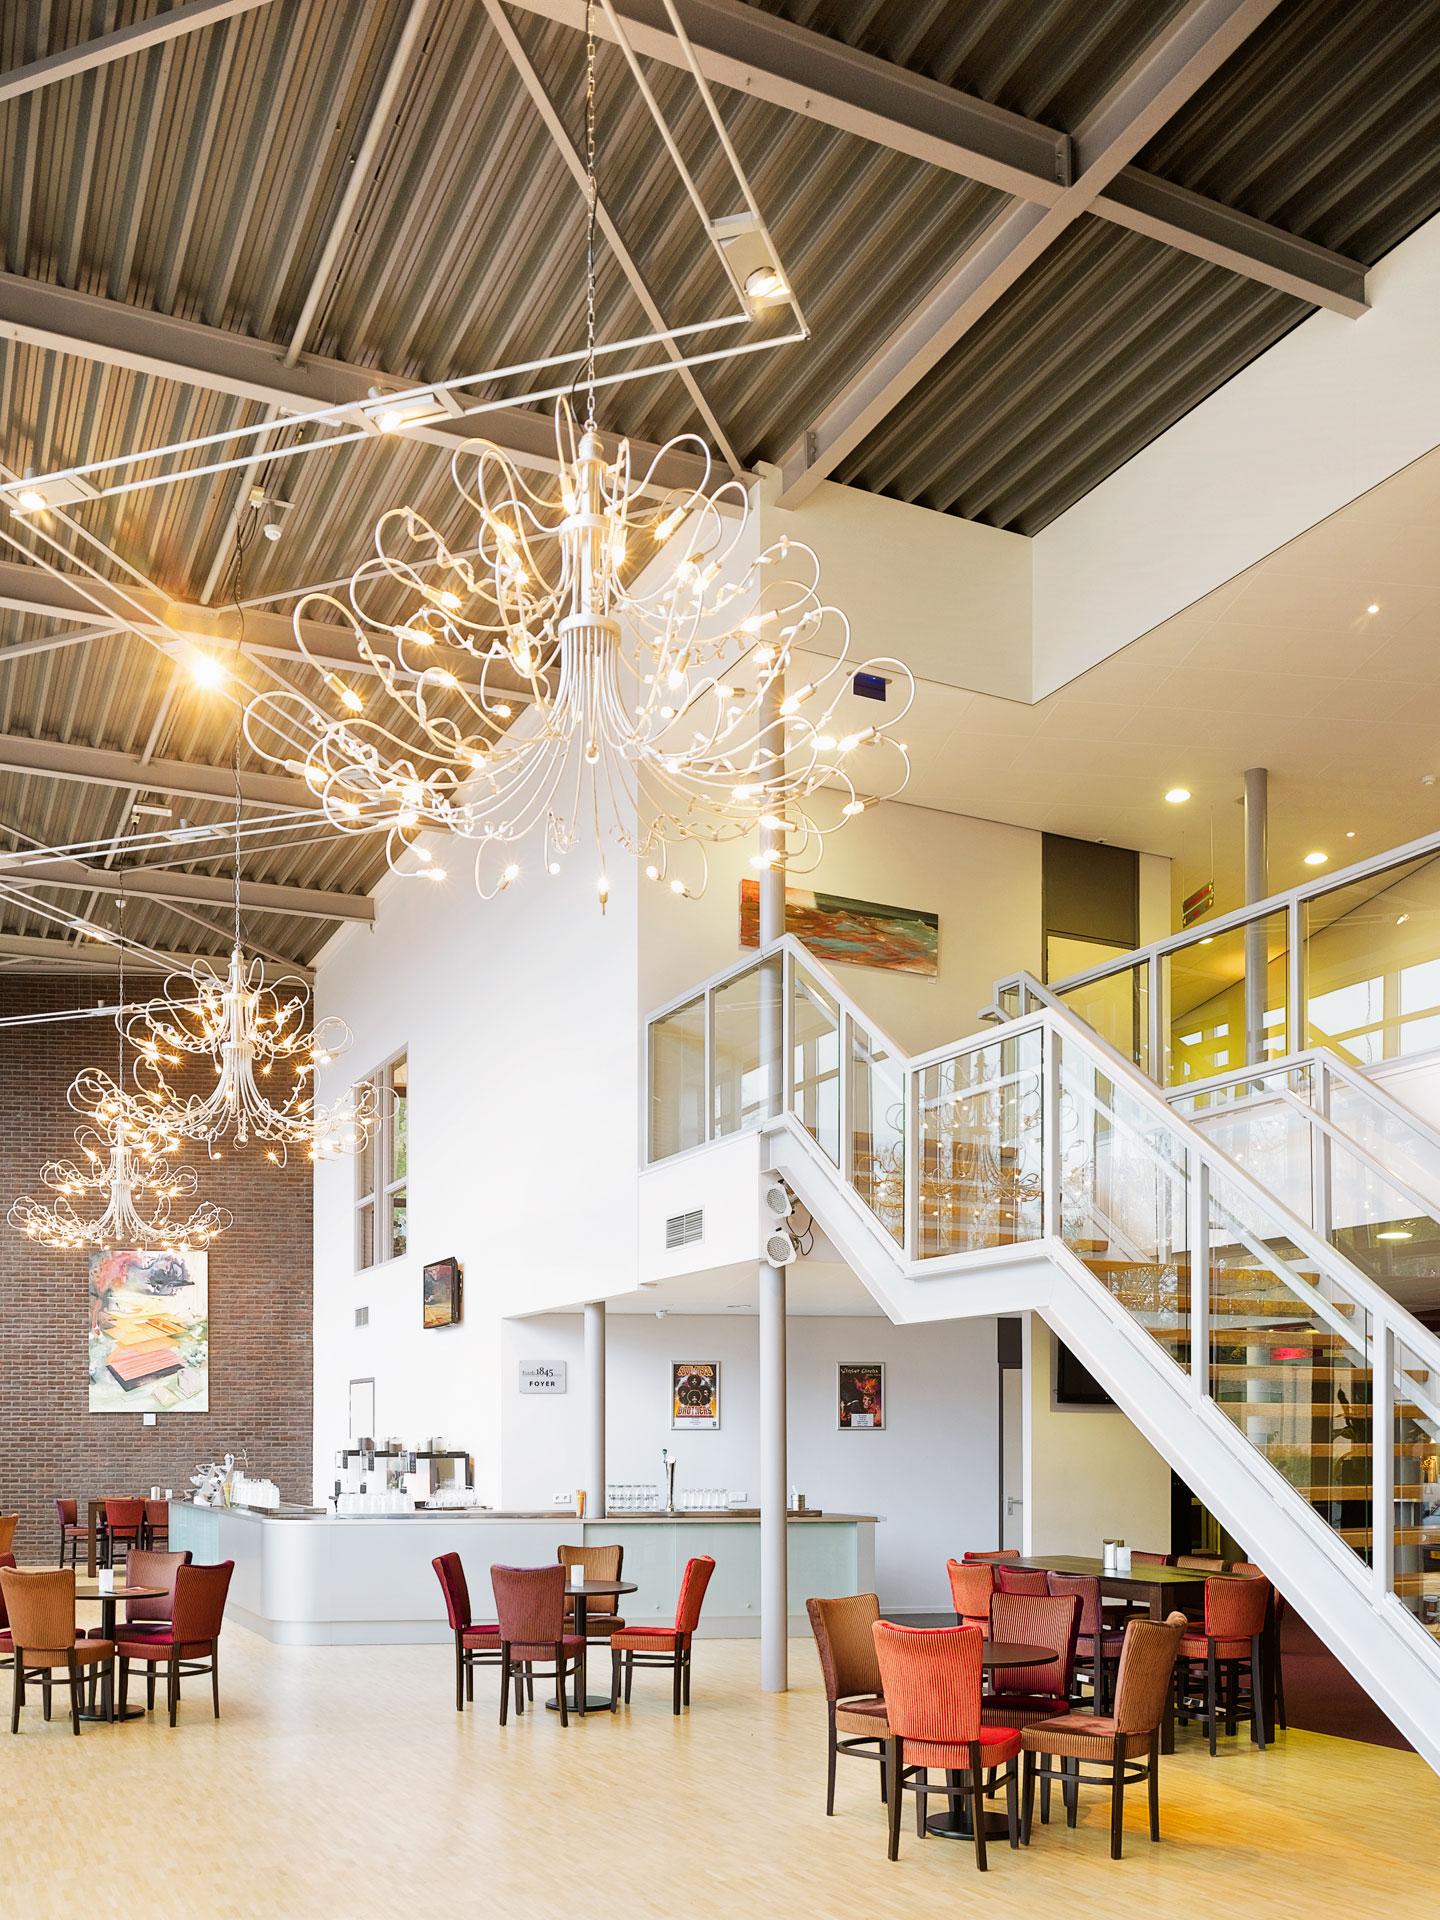 3948-Barneveld-Schaffelaar-theater-interieur - Bureau Bos